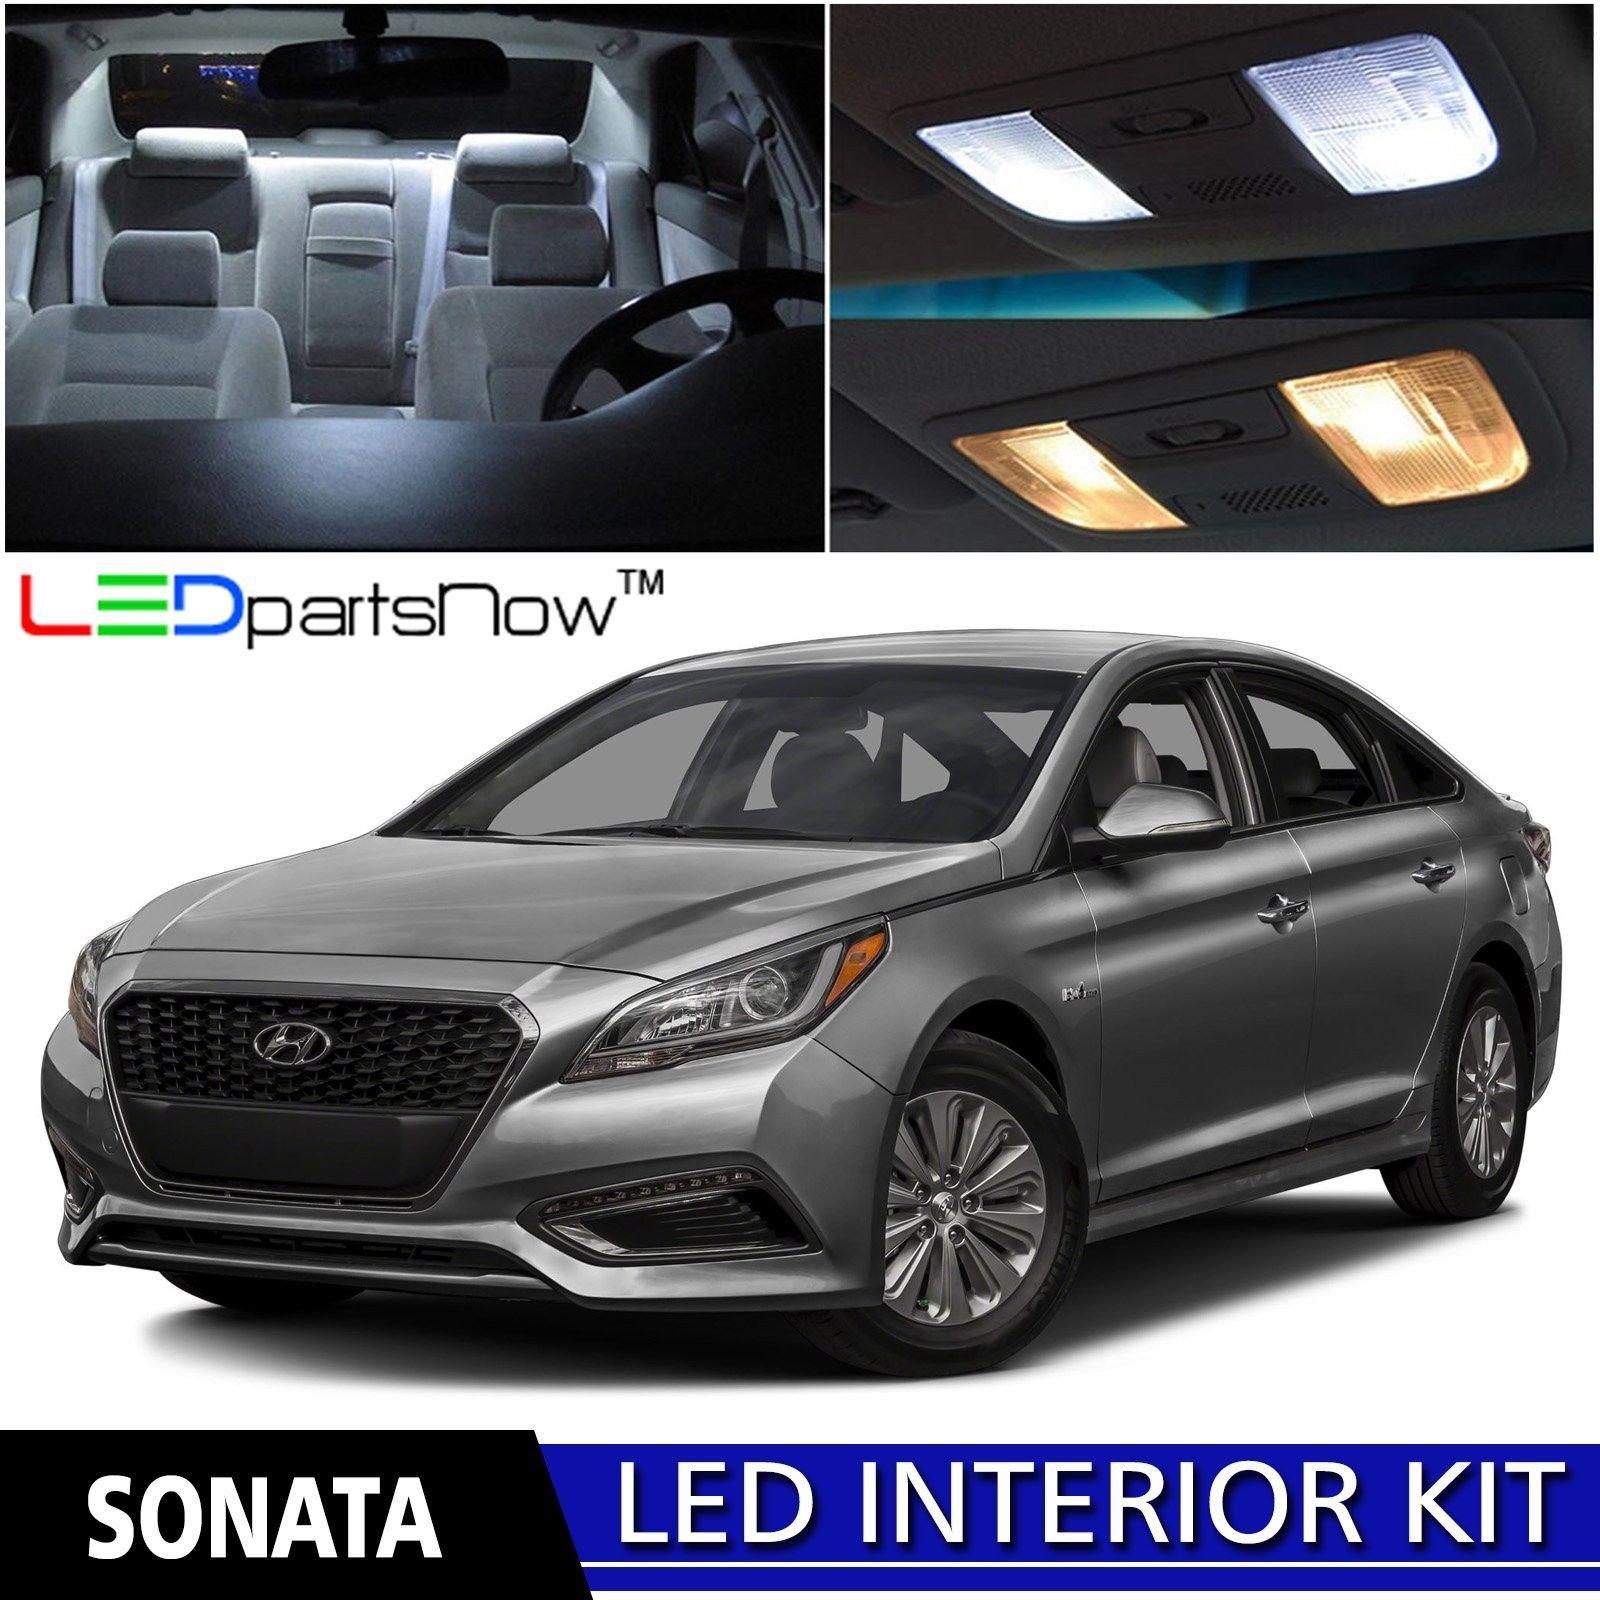 Hyundai Sonata 2015 Review: Awesome LEDpartsNow 2015-2016 Hyundai Sonata LED Interior